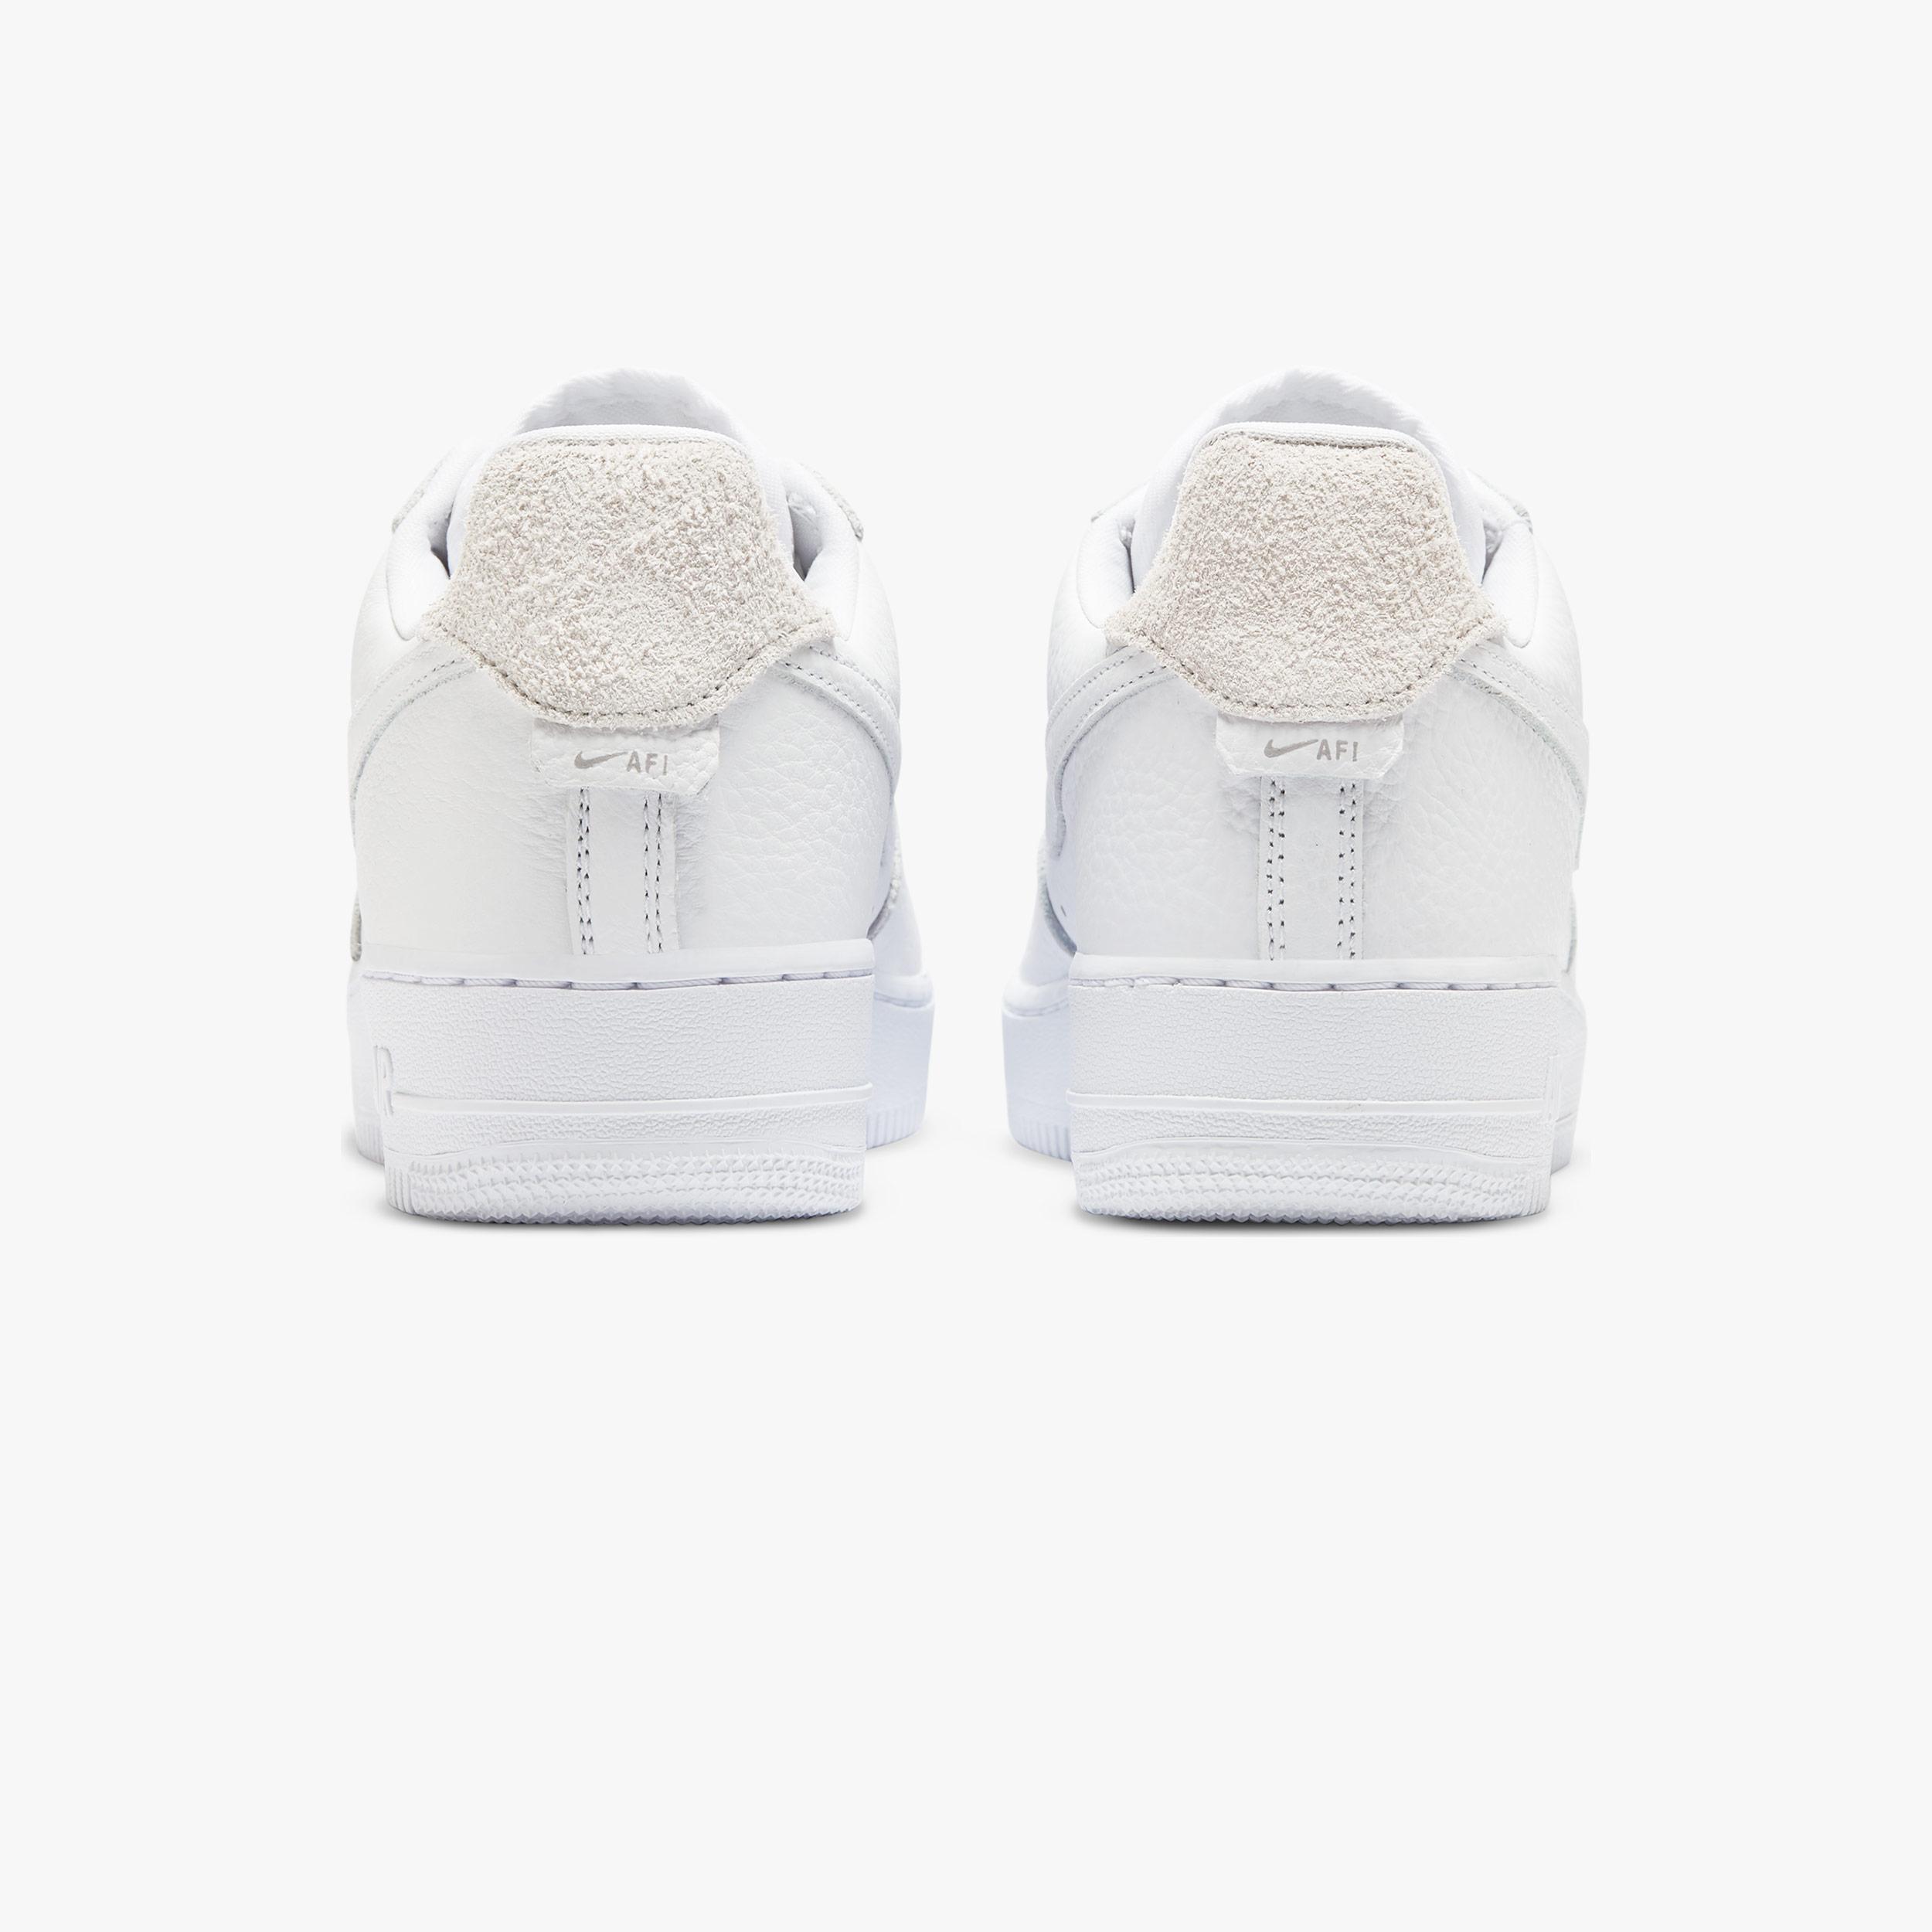 Nike Air Force 1 '07 Craft - Cn2873-101 - SNS | sneakers ...